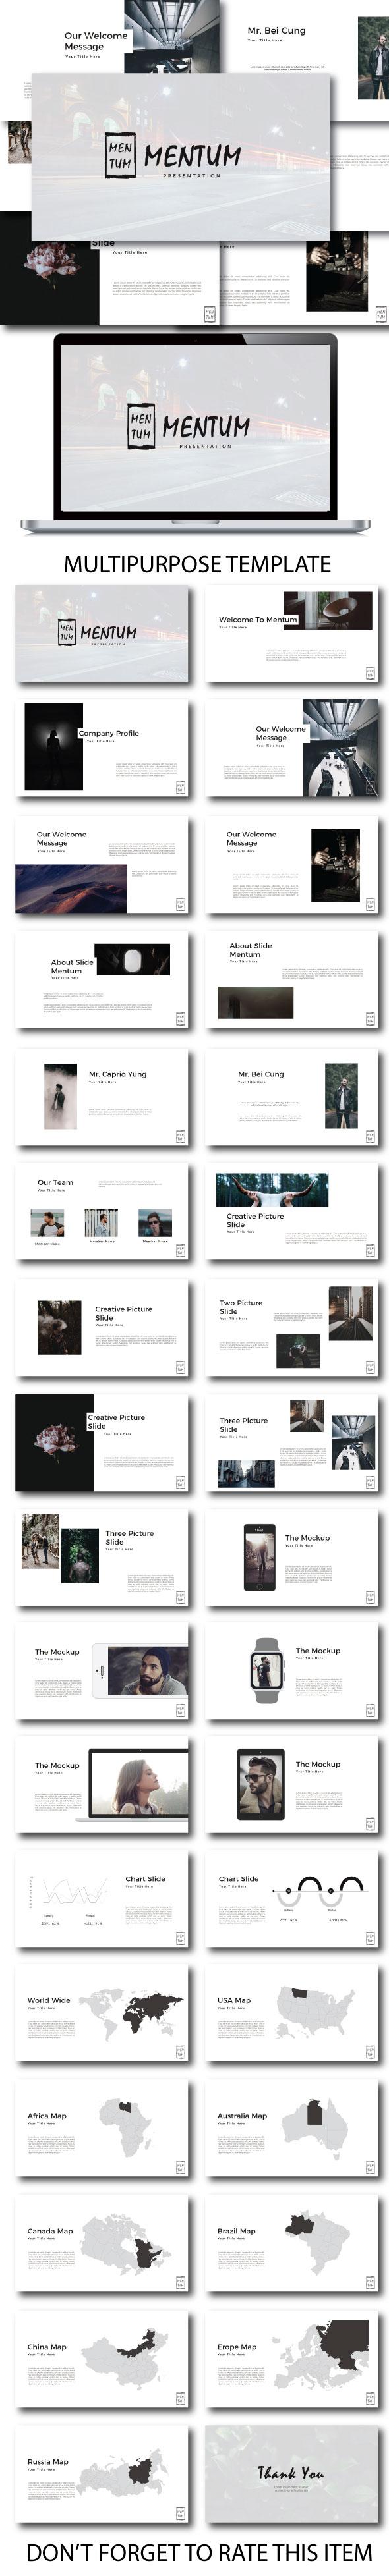 Mentum Multipurpose Google Slide - Google Slides Presentation Templates